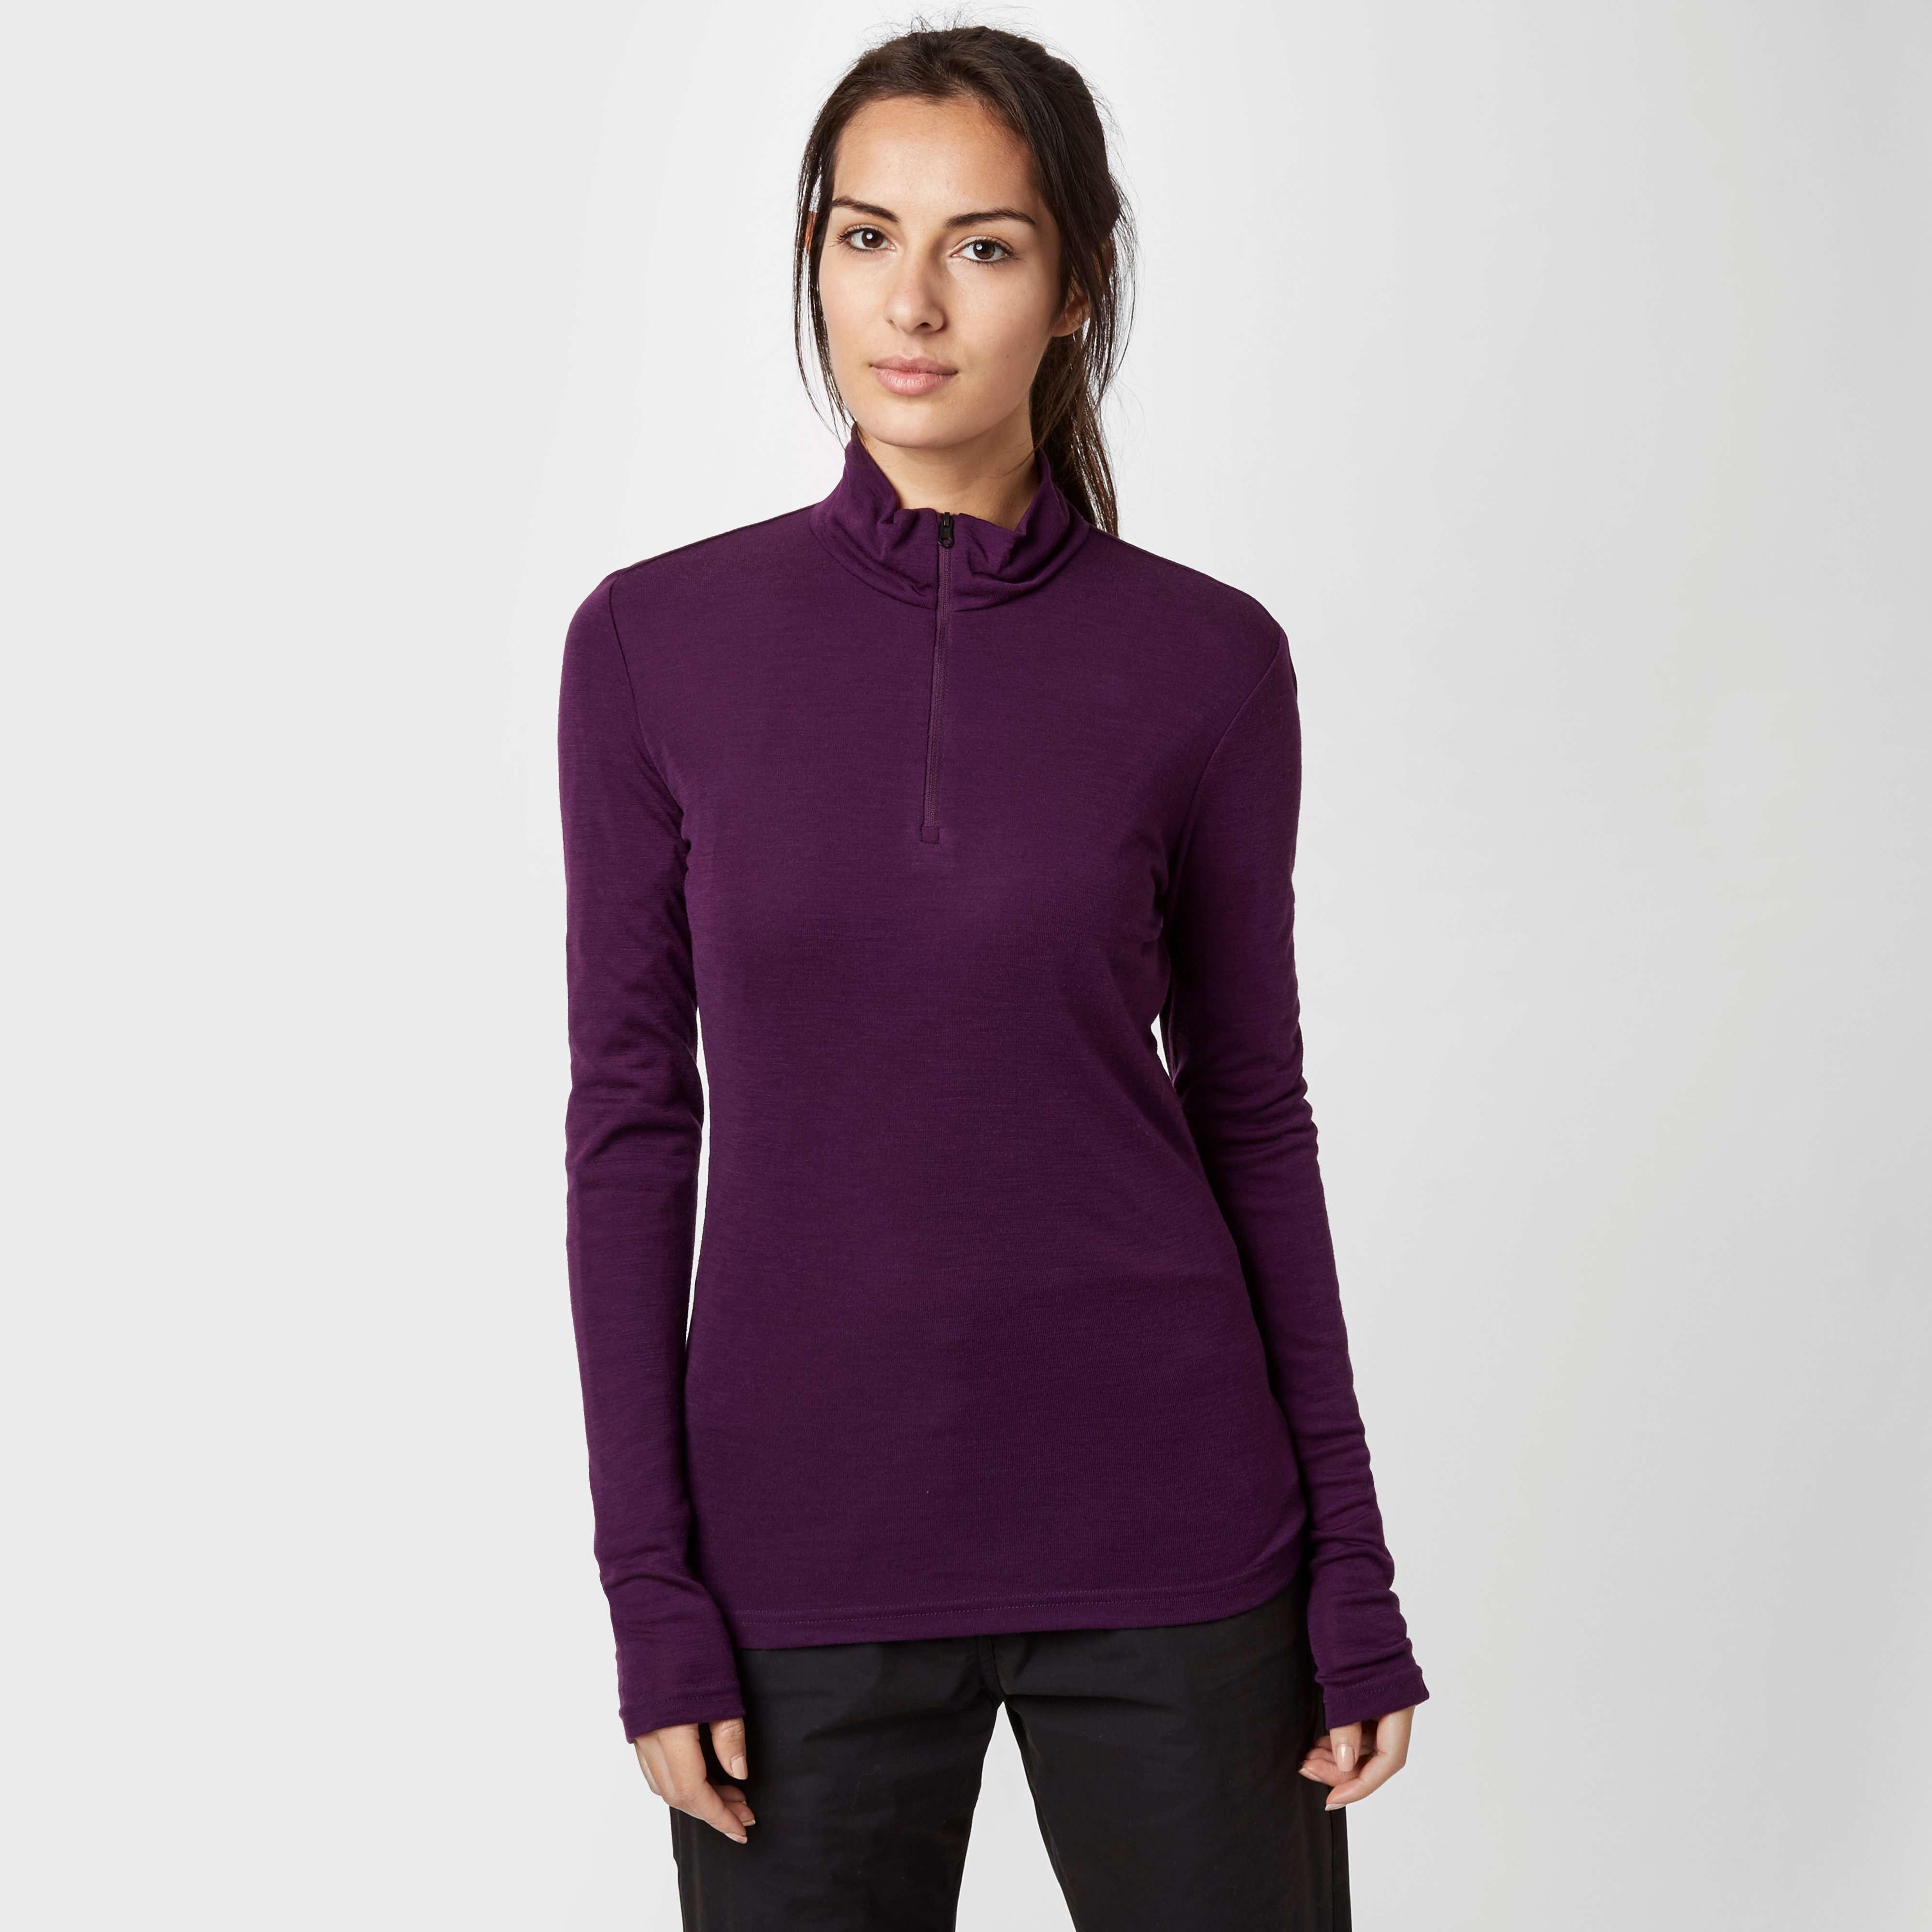 ICEBREAKER Women's Everyday Long Sleeve Half Zip Baselayer